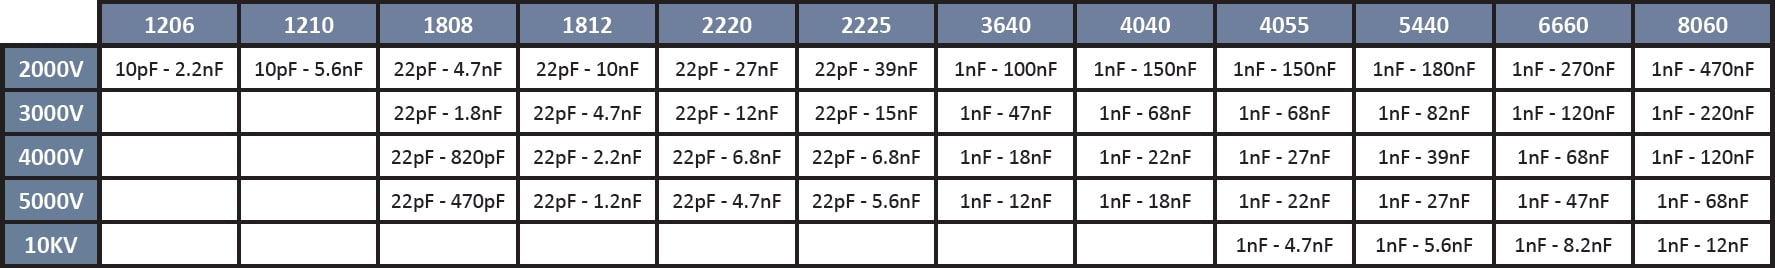 SRT Microcéramique X7R series (2kV to 10kV)